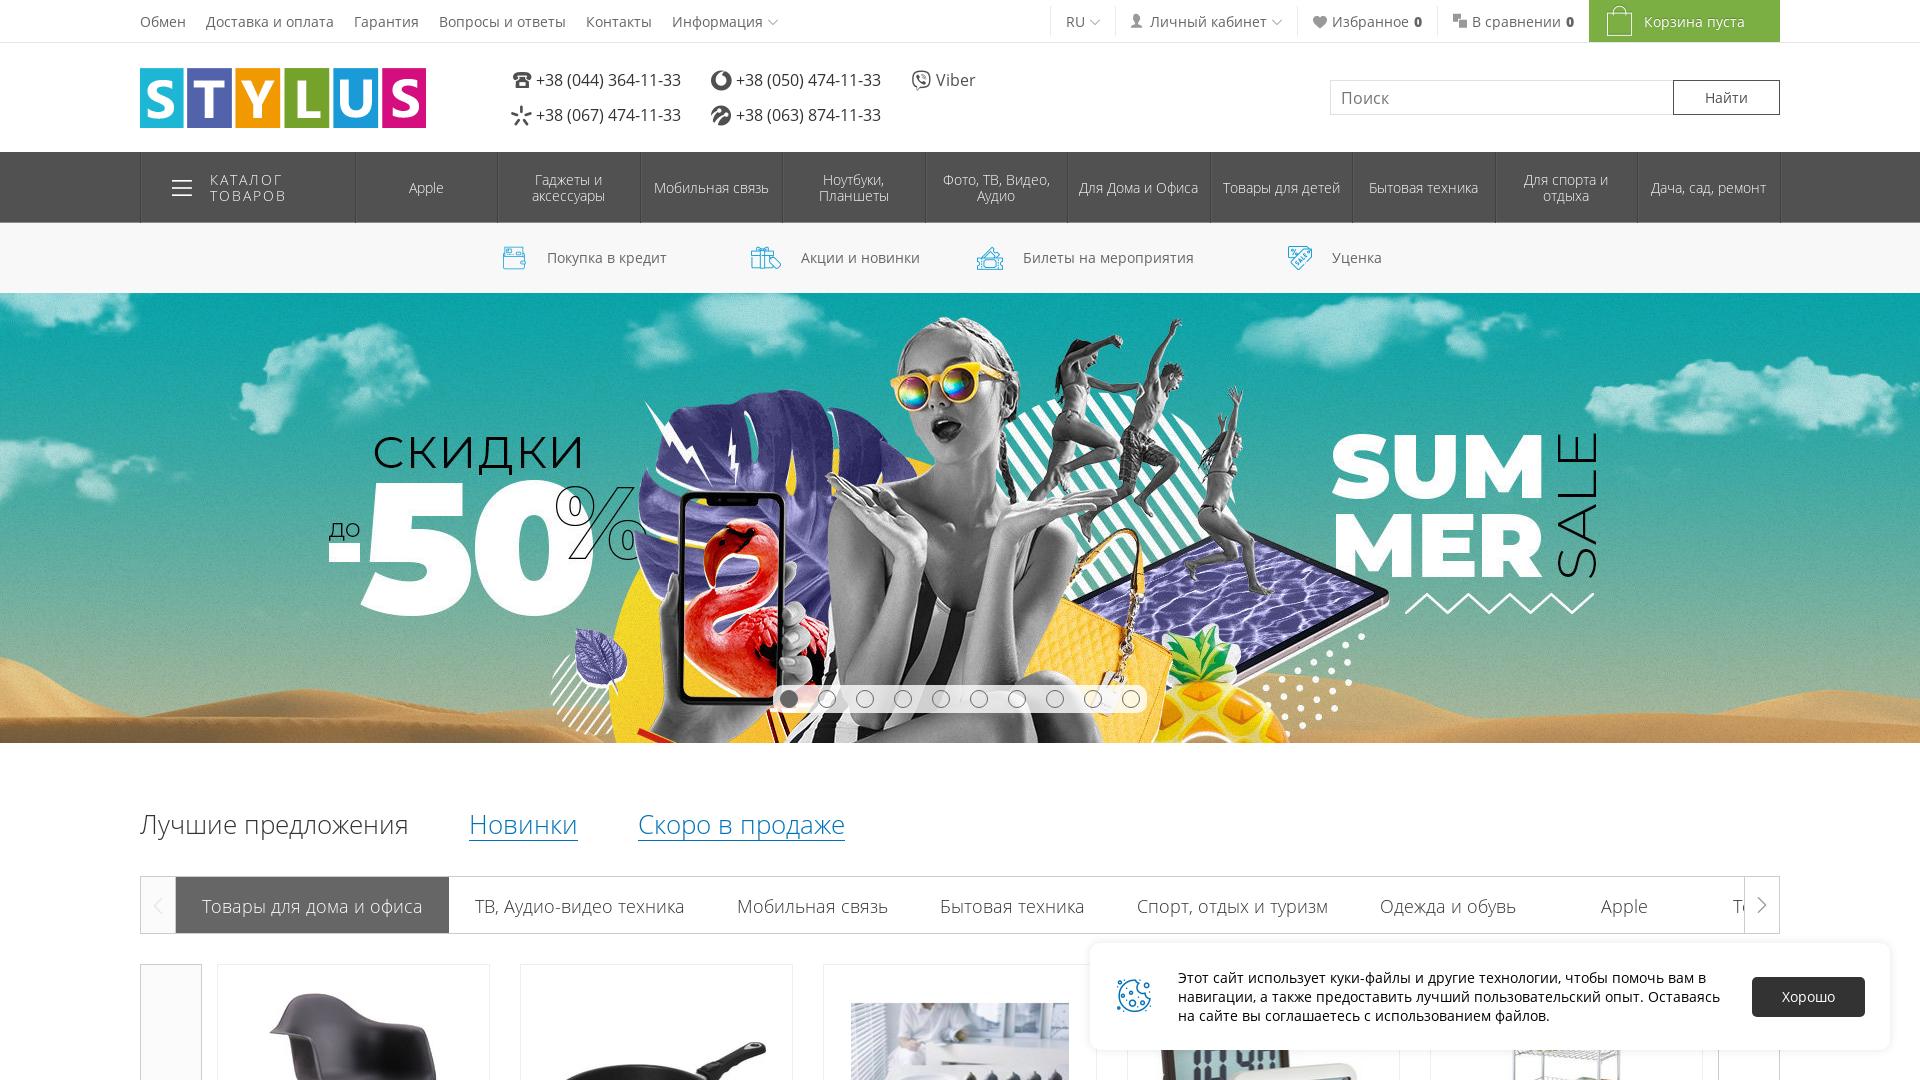 Stylus UA website